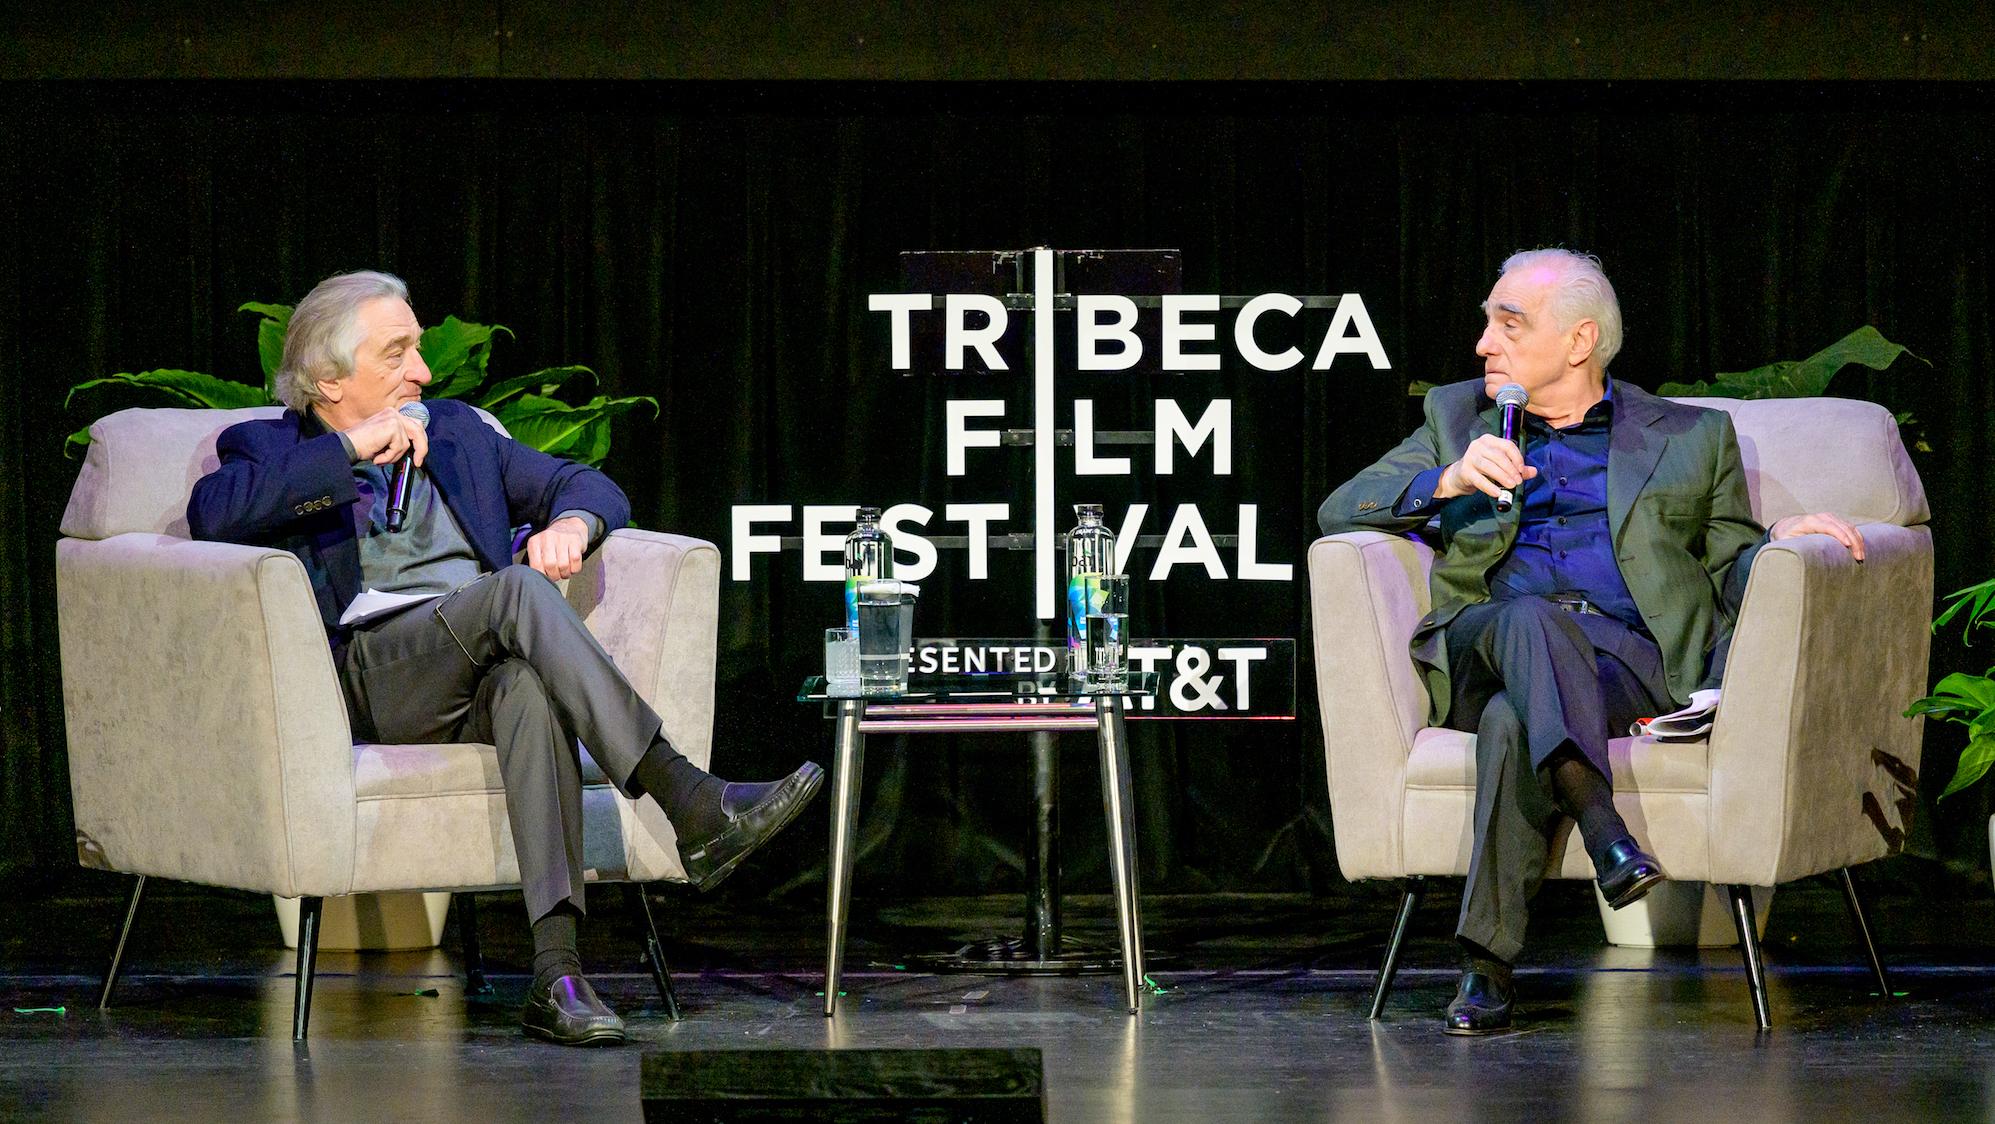 Martin Scorsese, Robert De Niro at Tribeca Film Fest: 10 Things We Learned